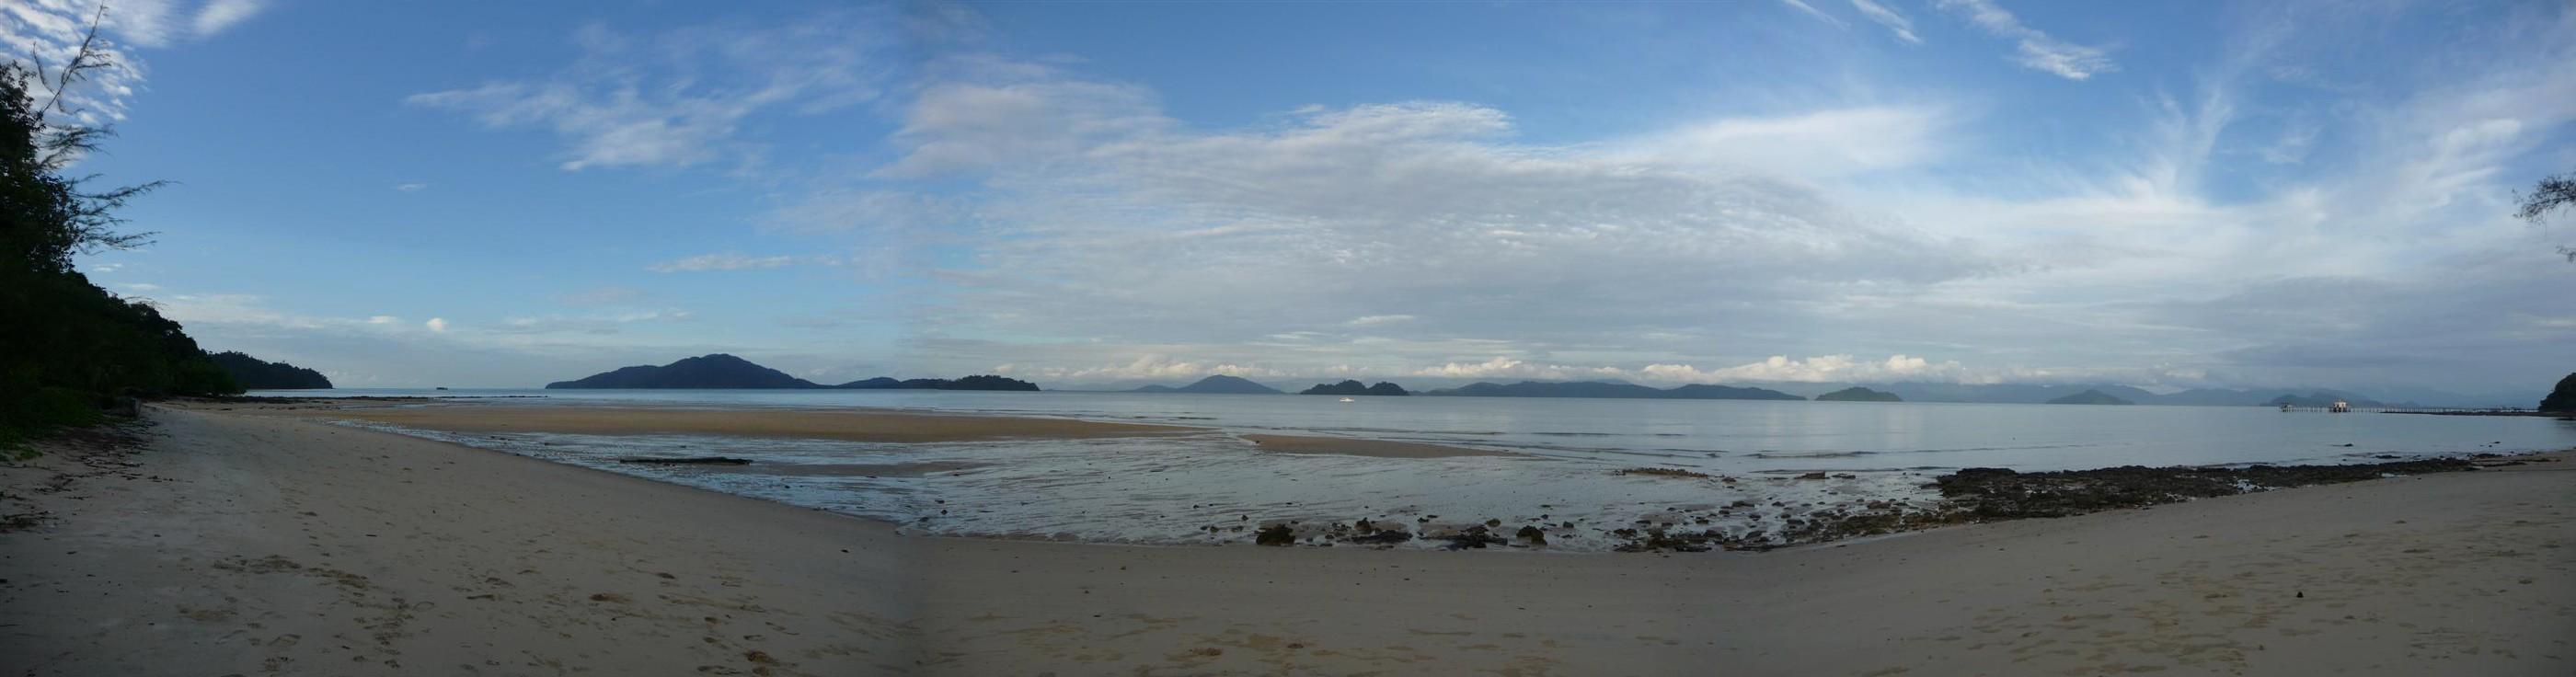 Koh Payam our beachfront